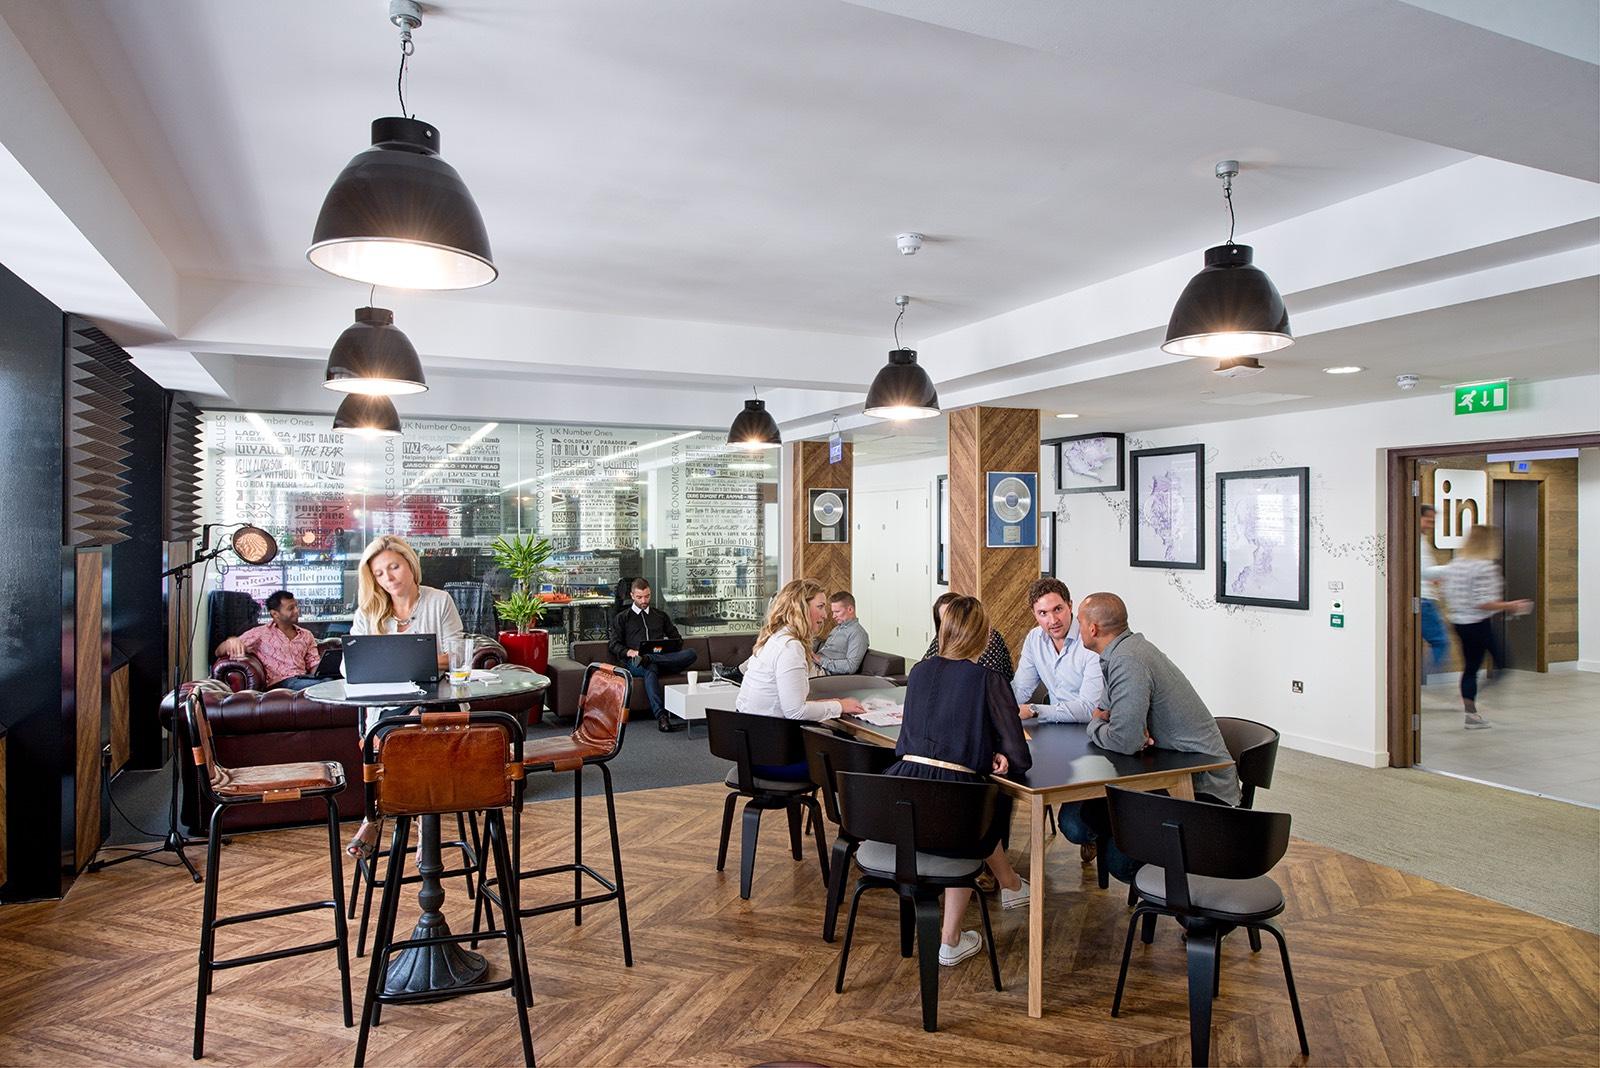 linkedin-office-london-4